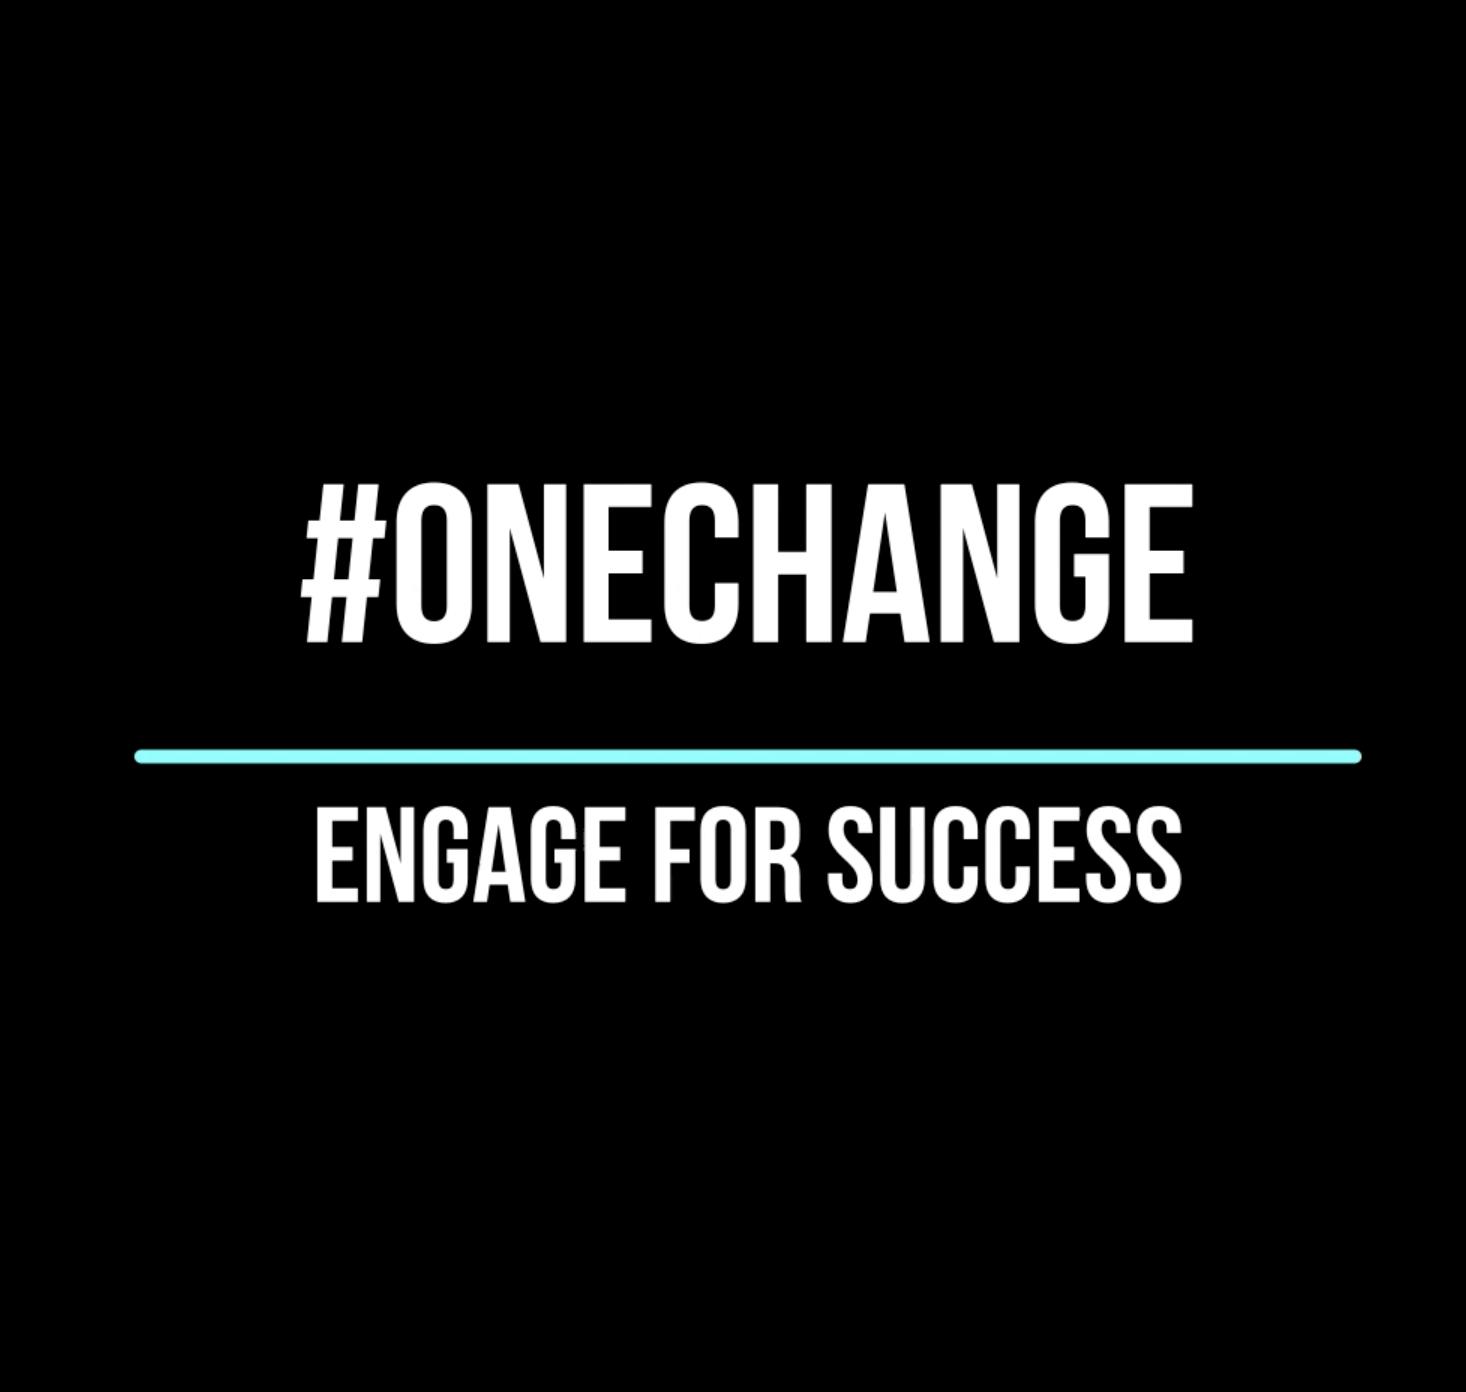 #onechange